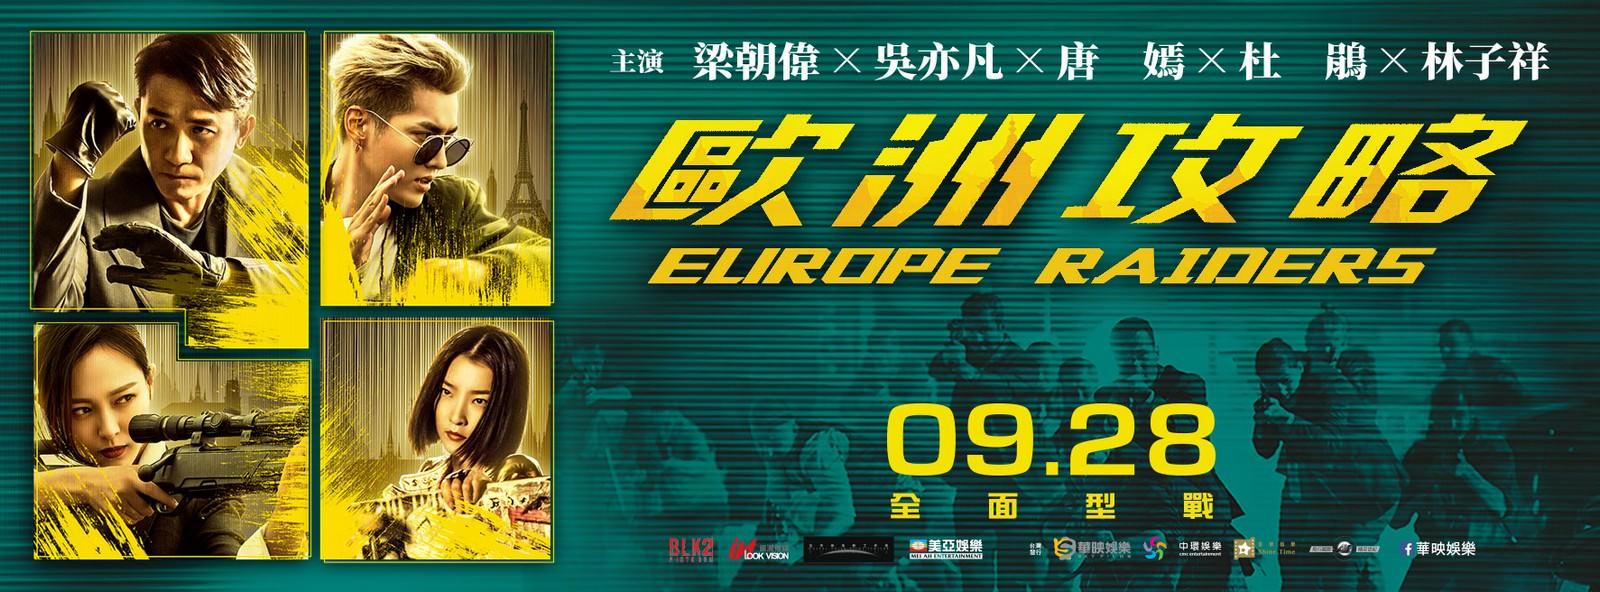 Movie, 歐洲攻略(中國.香港, 2018) / 歐洲攻略(台灣) / 欧洲攻略(中國) / Europe Raiders(英文), 電影海報, 台灣, 橫版